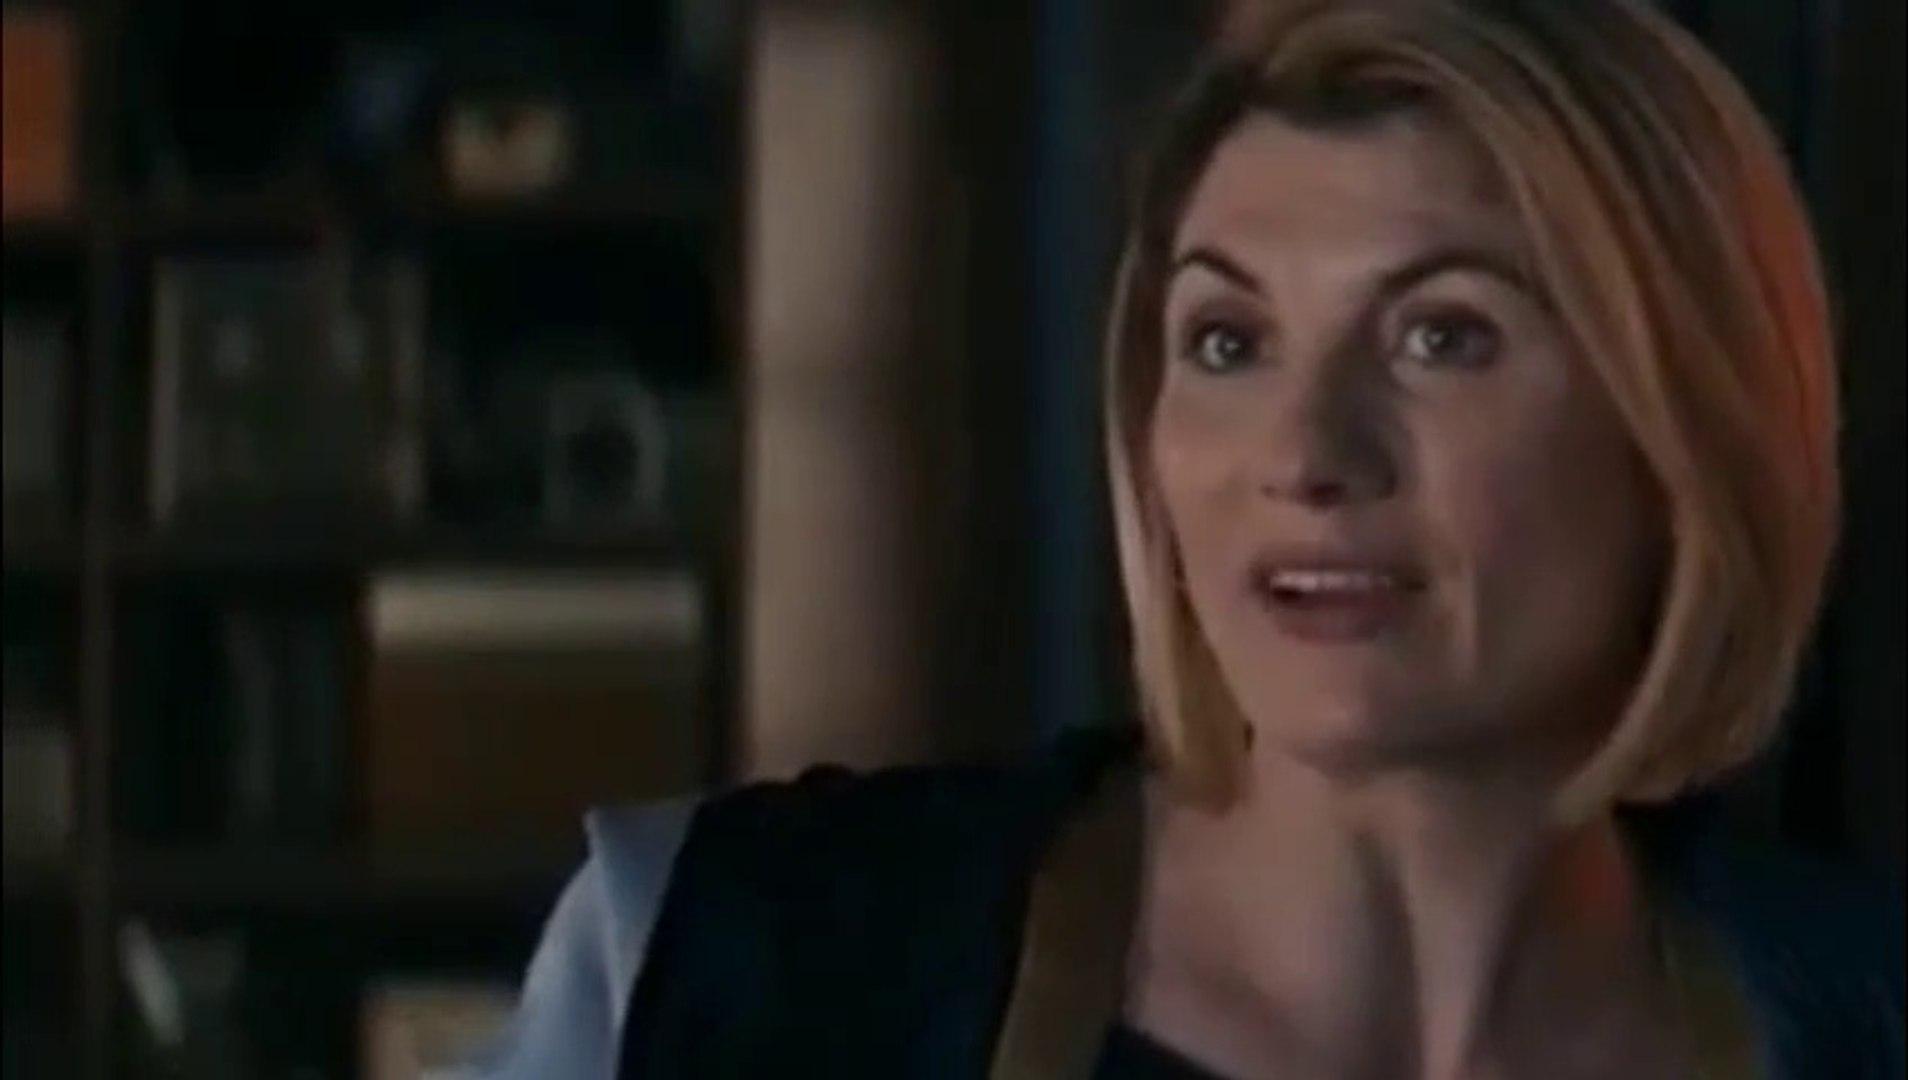 Doctor Who - S12E01 - Spyfall (1) - January 01, 2020    Teen Titans Go! (01/01/2020)